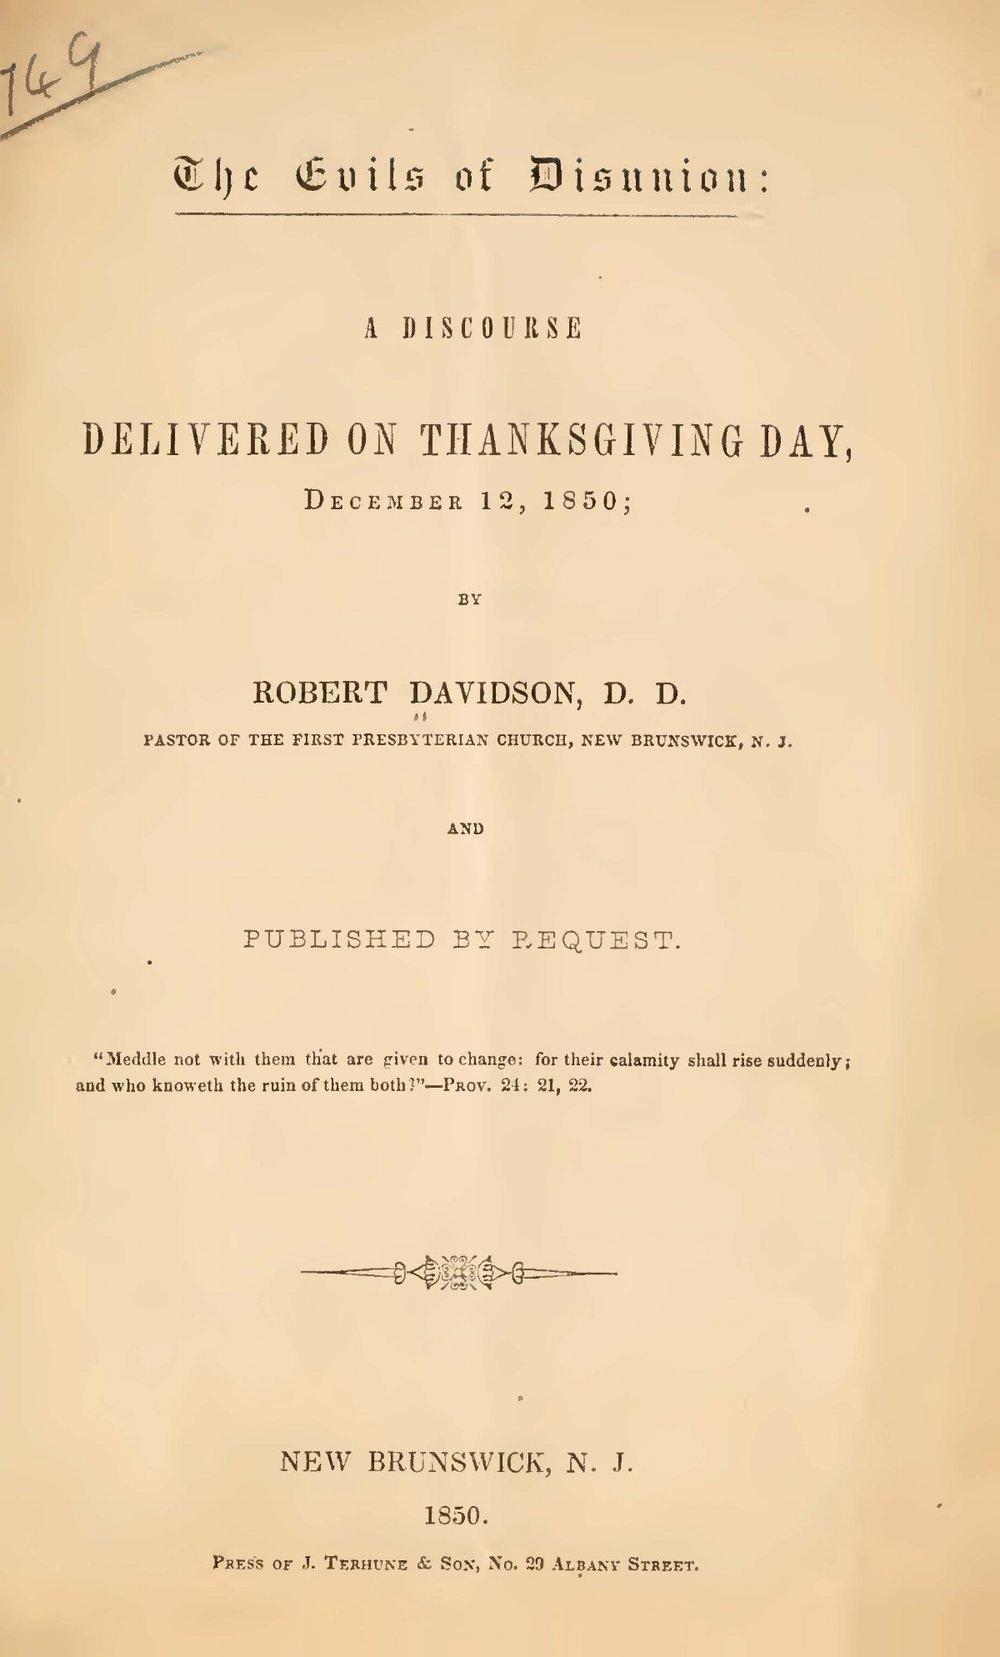 Davidson, Robert, The Evils of Disunion Title Page.jpg